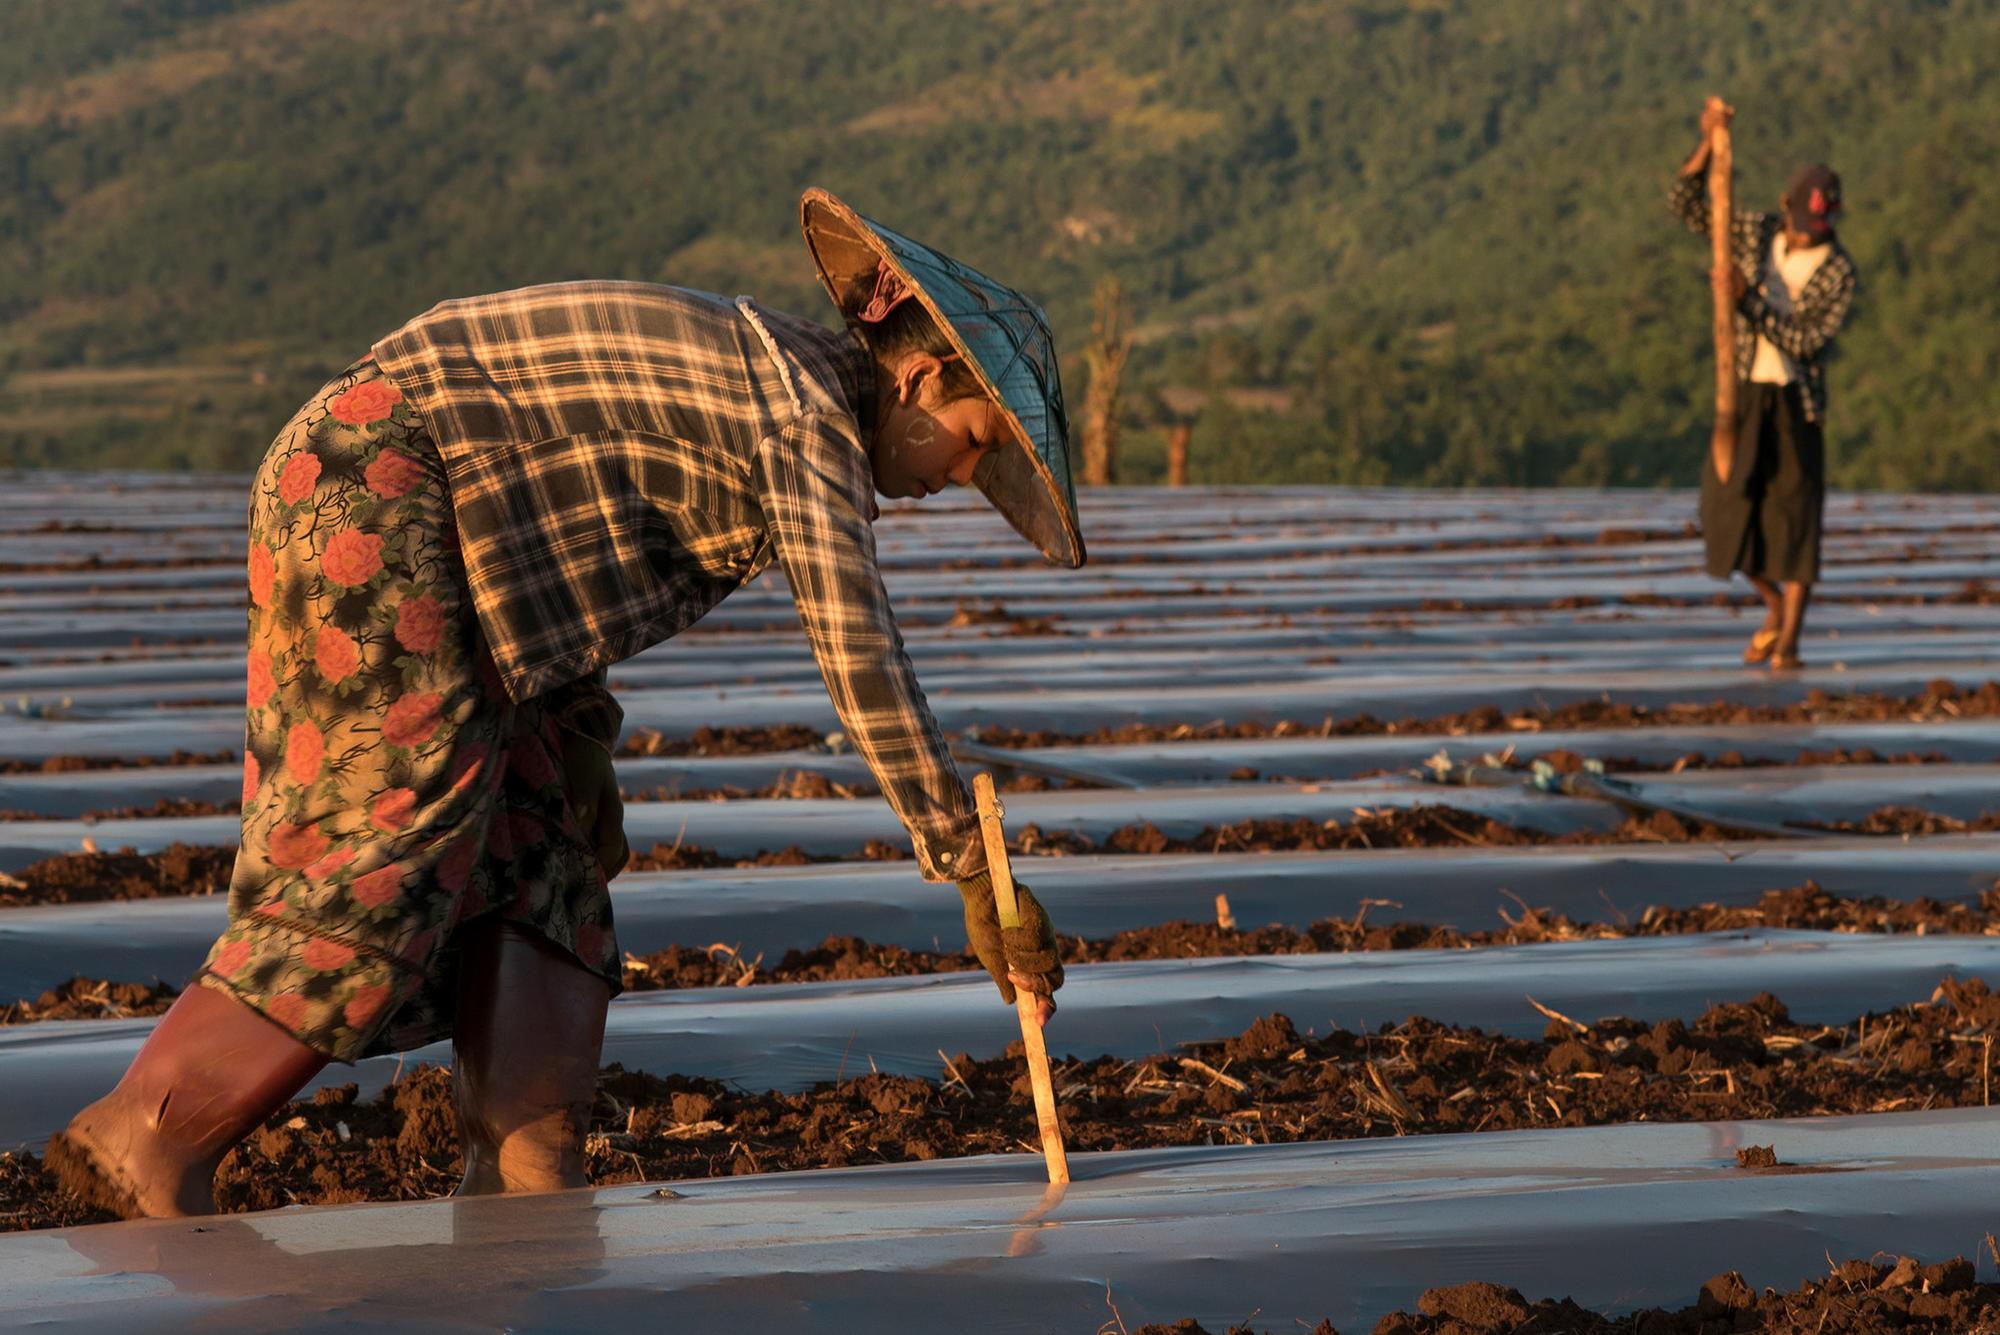 Laborers work in a melon plantation